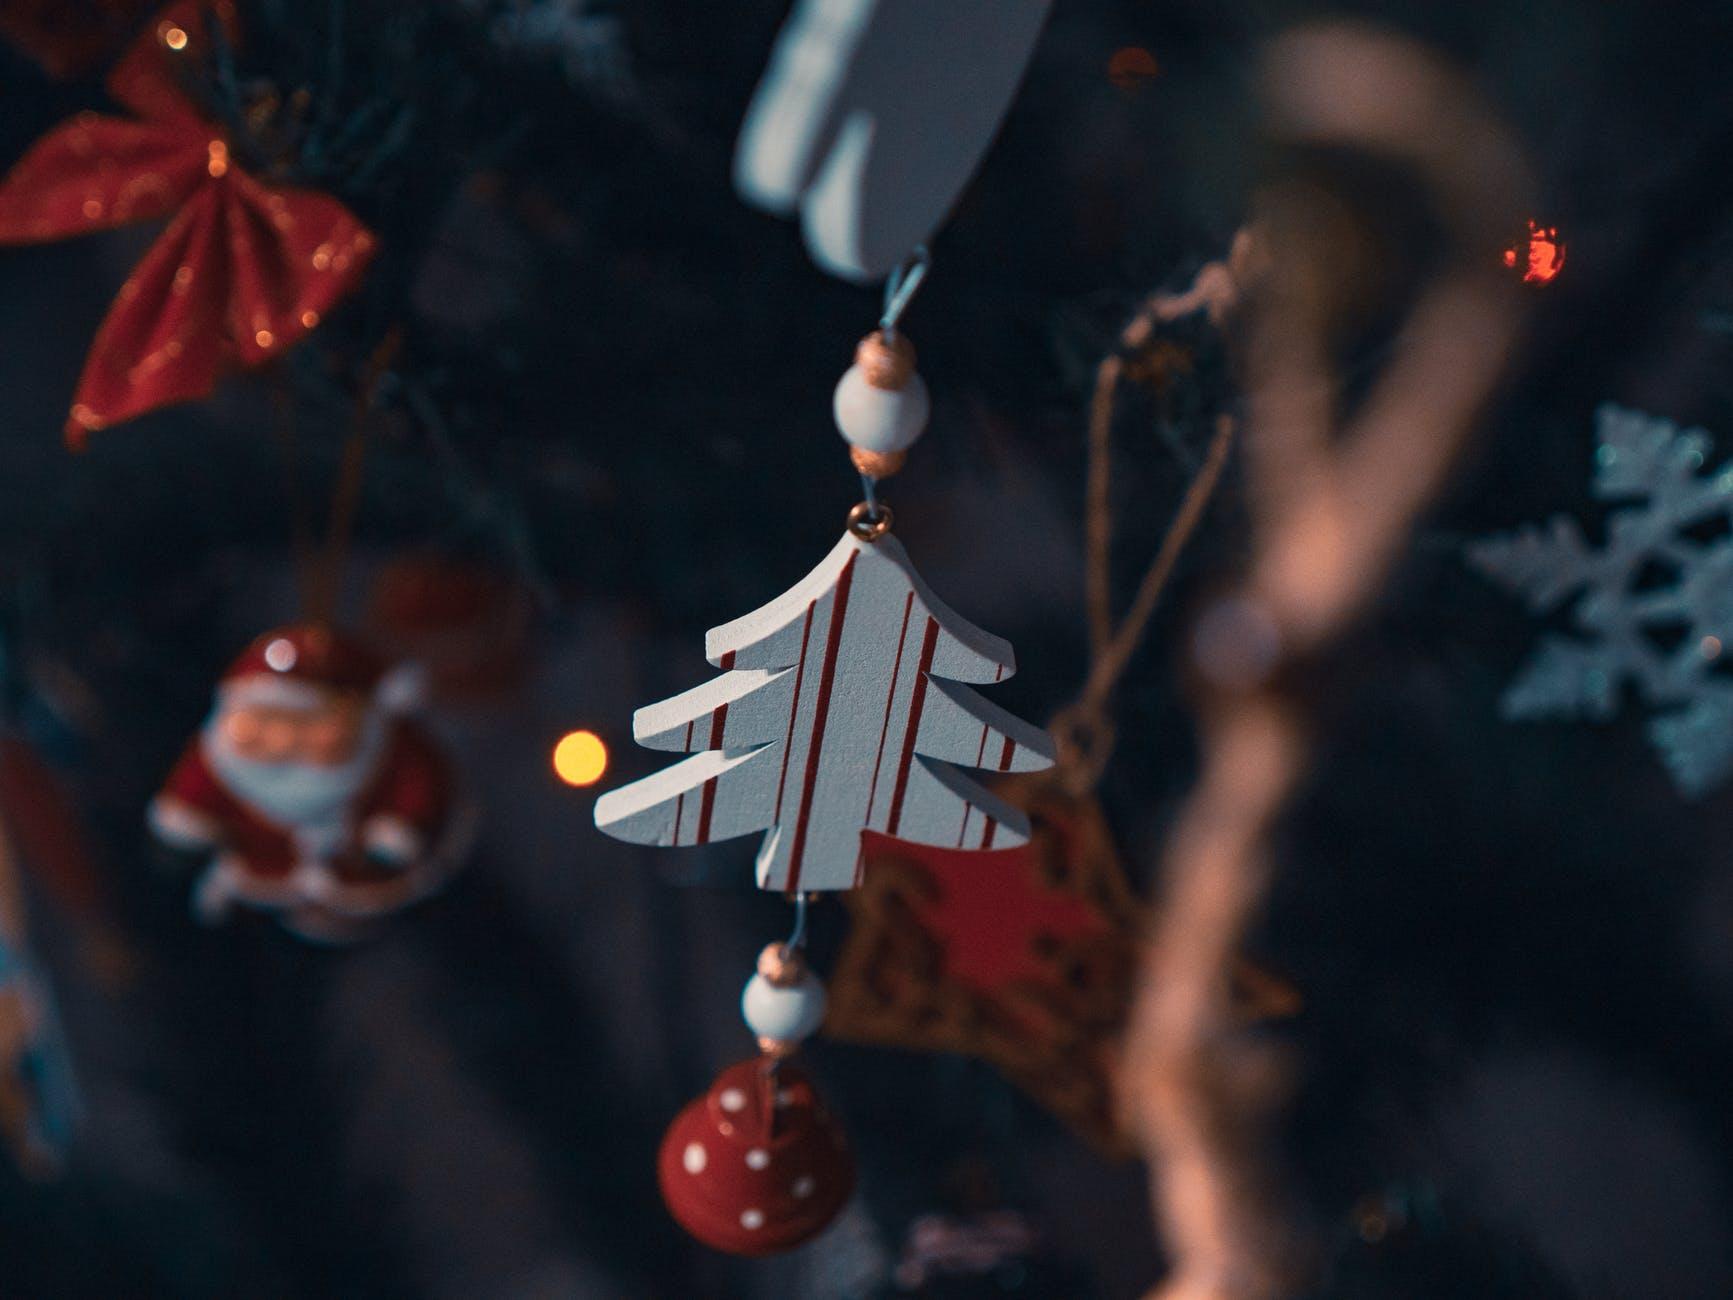 Dragi Božiću, gdje si se sakrio?